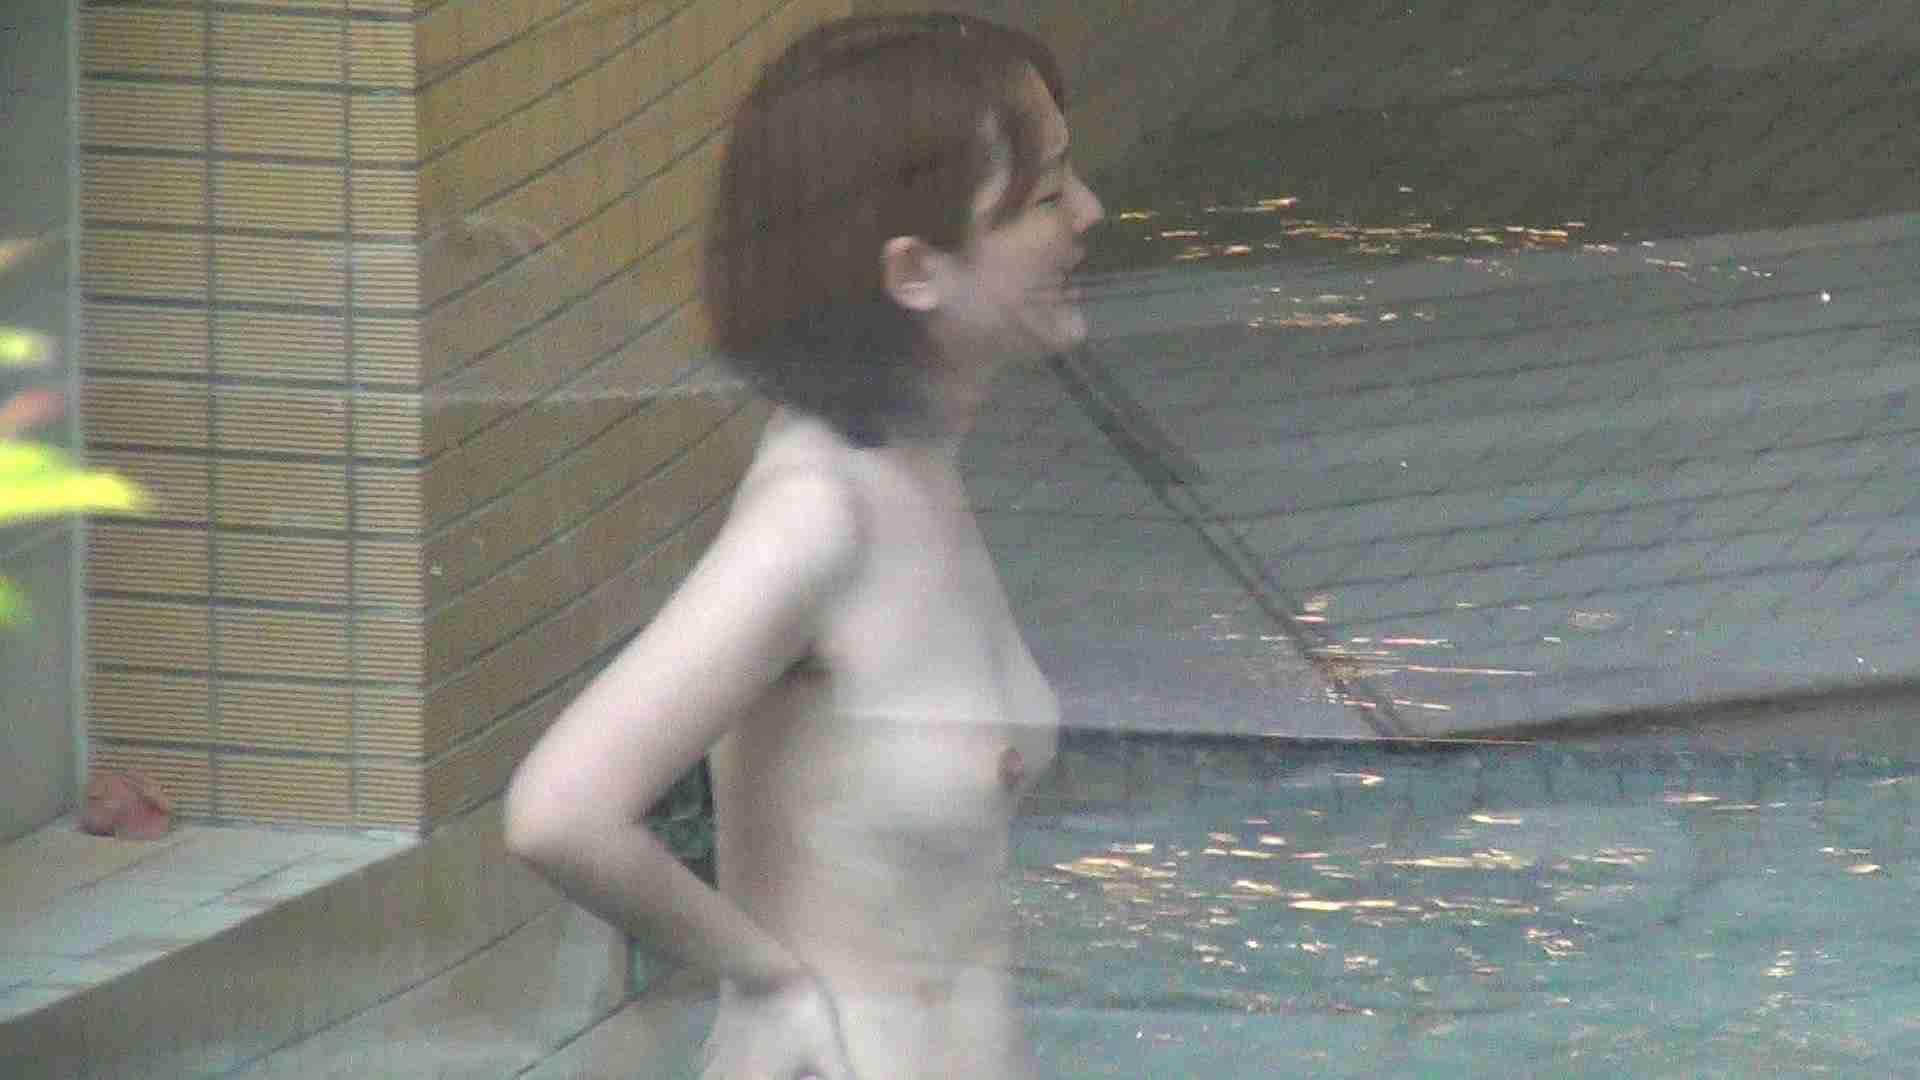 Aquaな露天風呂Vol.297 女体盗撮   OL女体  91連発 58